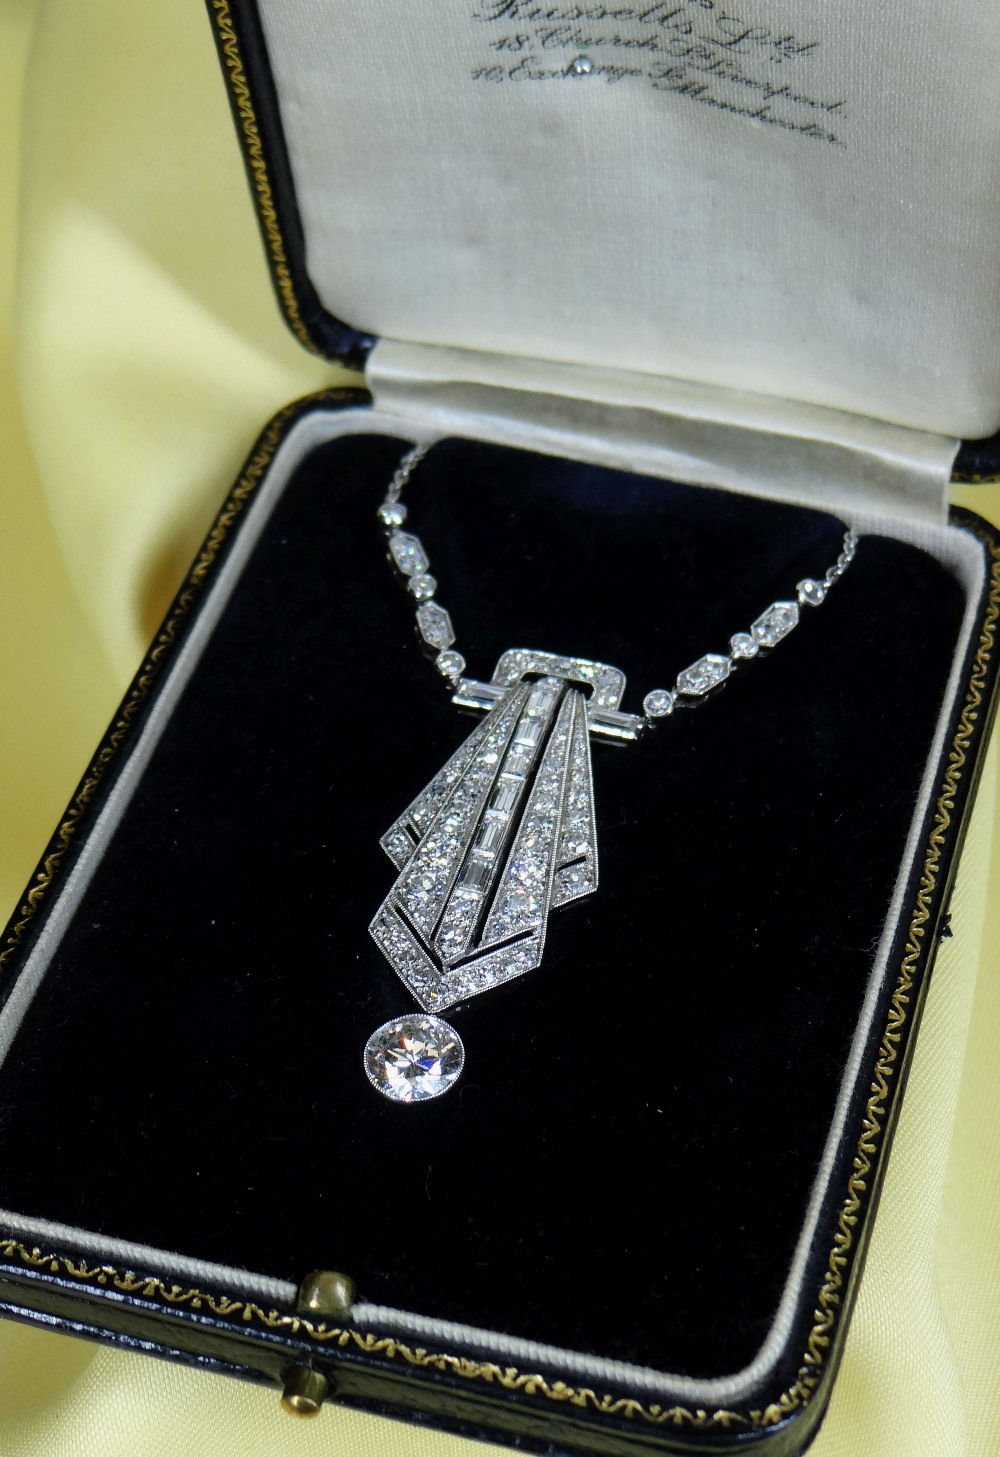 ART DECO DIAMOND ENCRUSTED PENDANT ON CHAIN, having diamond drop (1.0ct approx.) below the pierced - Image 4 of 4